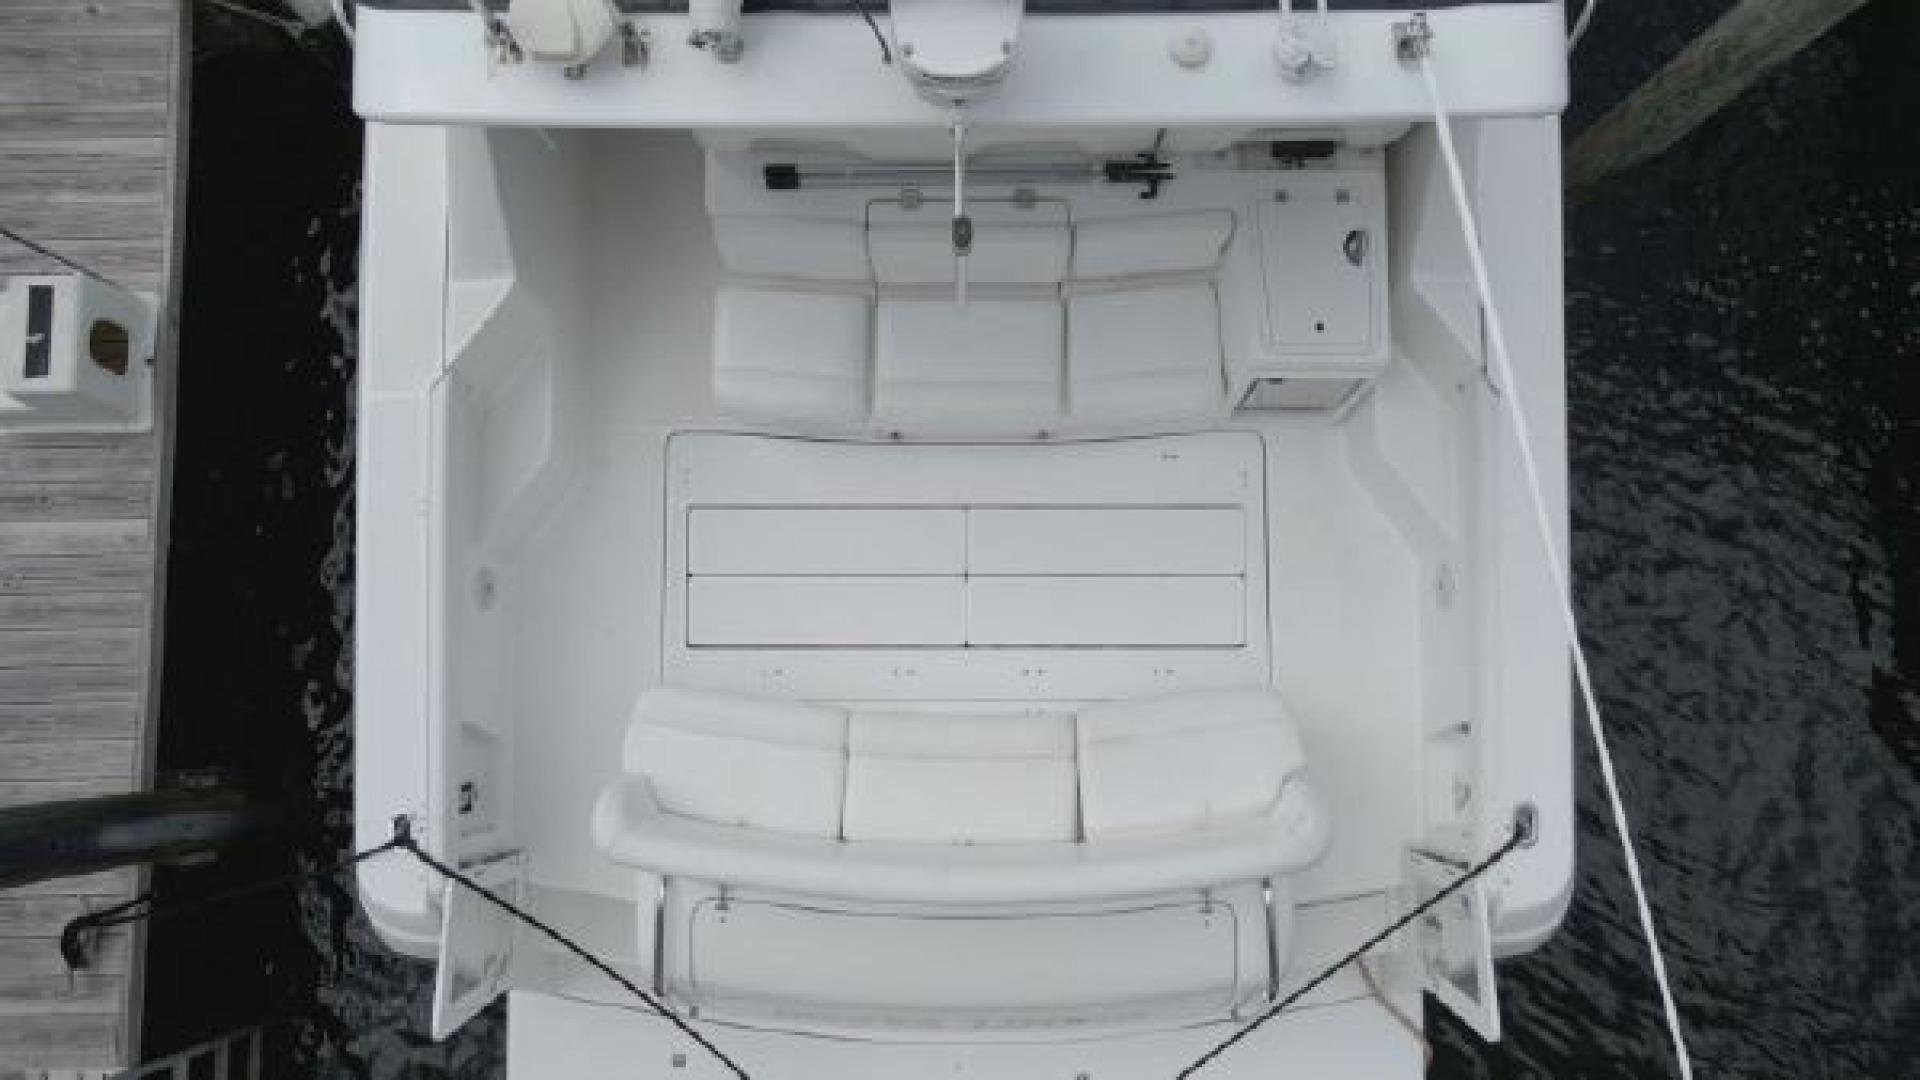 Tiara Yachts-4000 Express Cummins Engines 2001 -Boca Raton-Florida-United States-1564194   Thumbnail